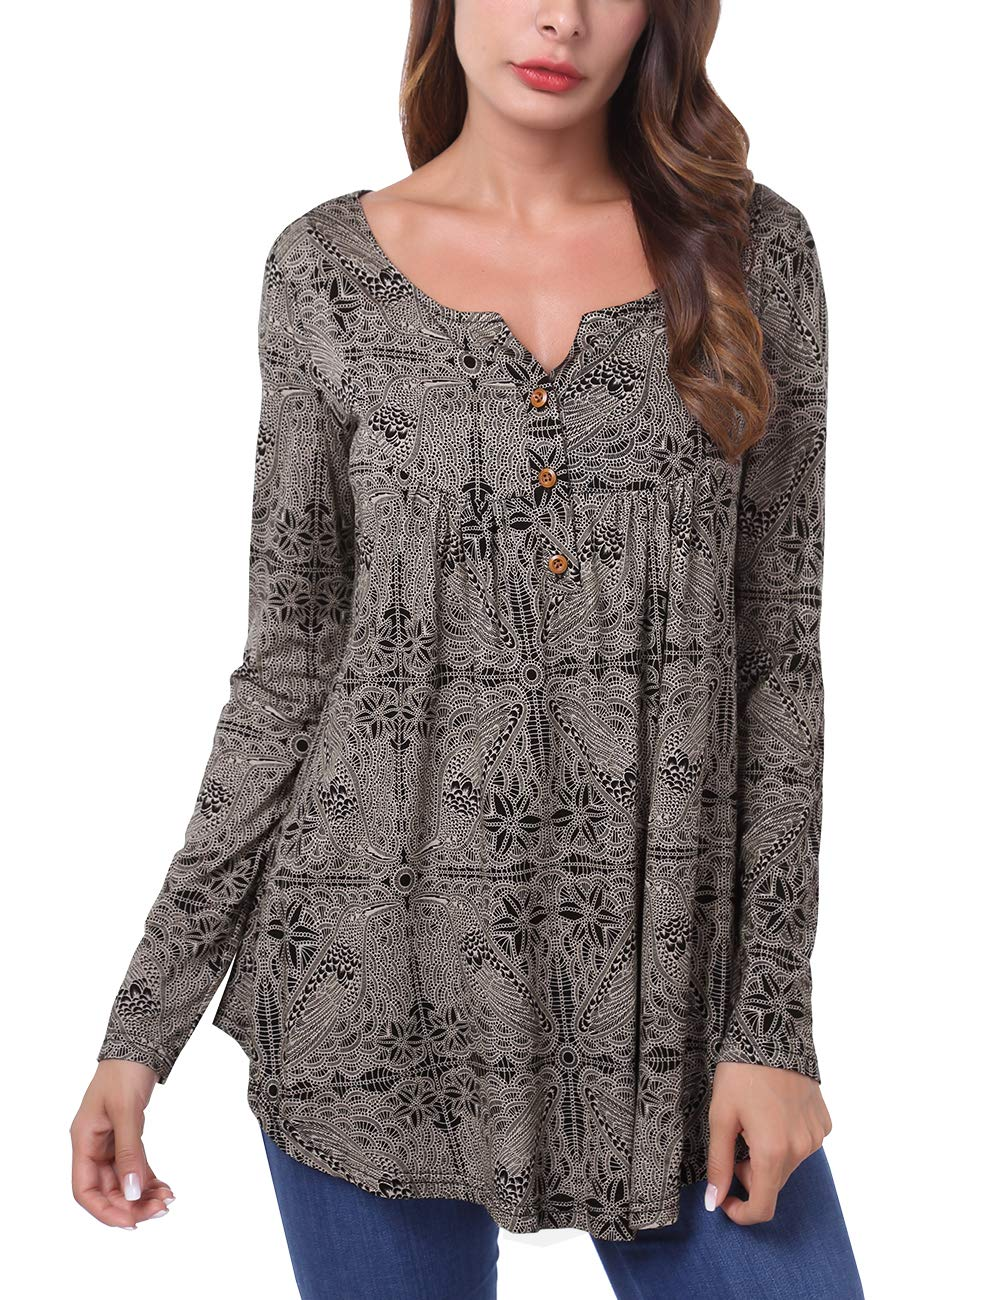 DJT FASHION Women's Pleated Long Sleeve Henley Shirt Button Flare Tunic Tops XX-Large Black Print